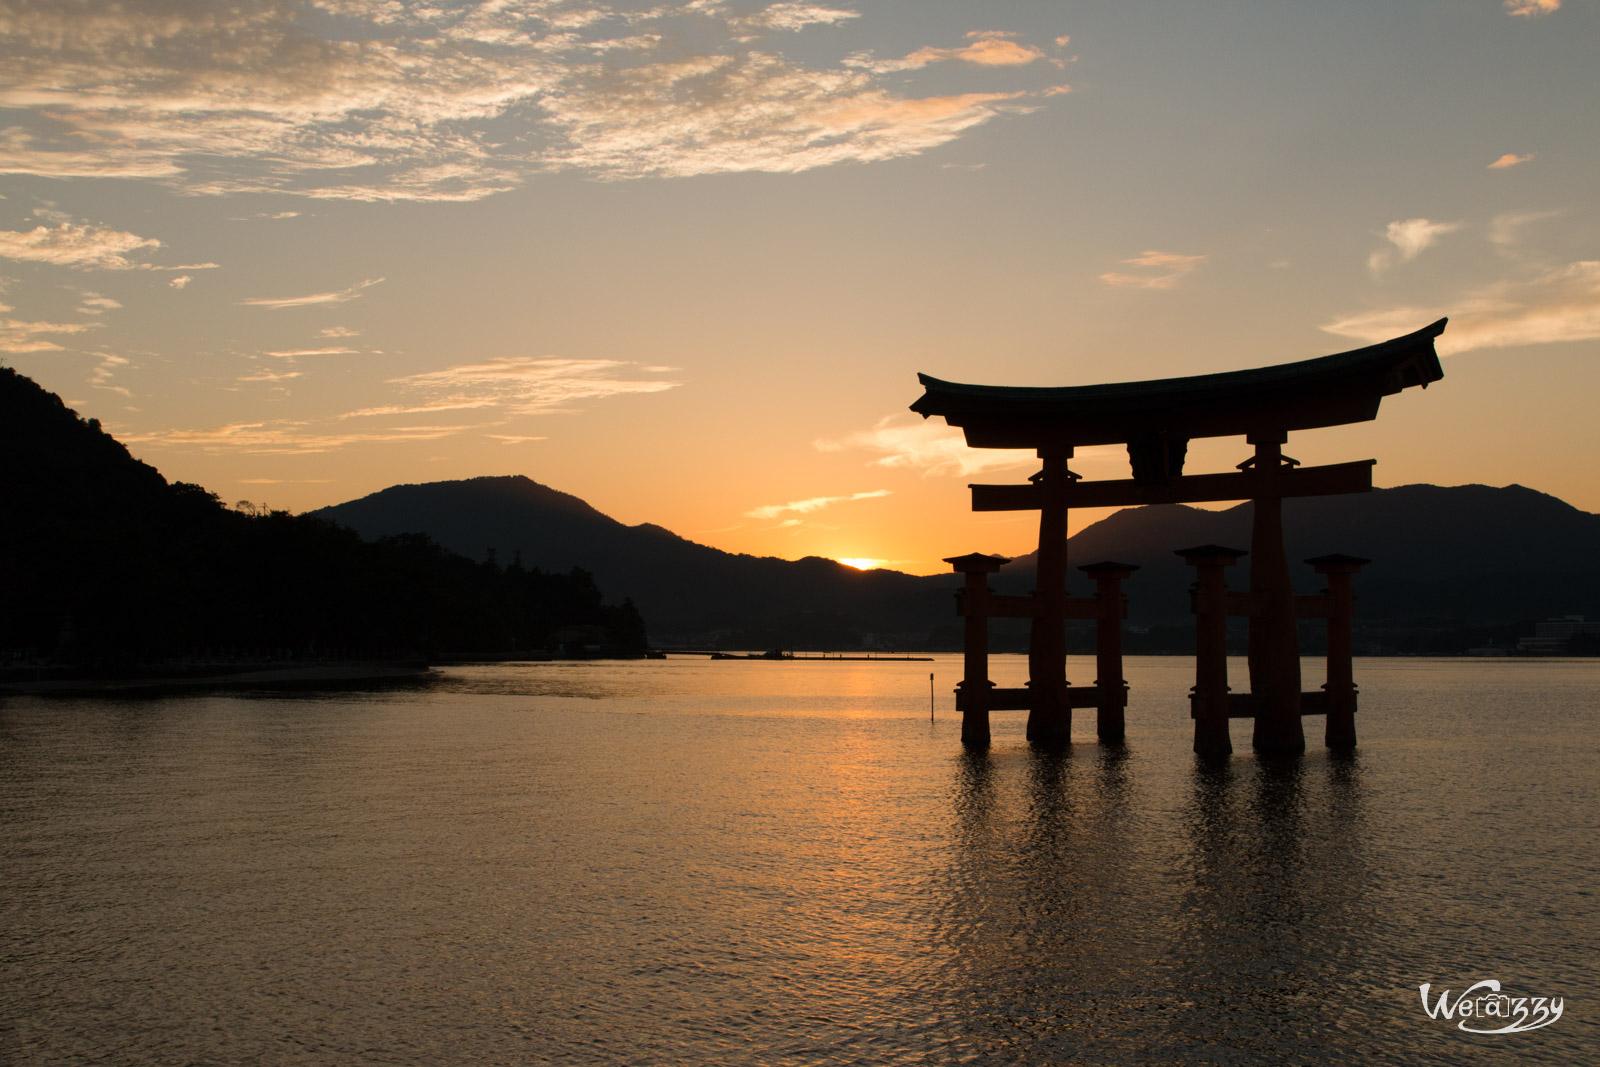 Mon voyage au Japon – Détente à Miyajima